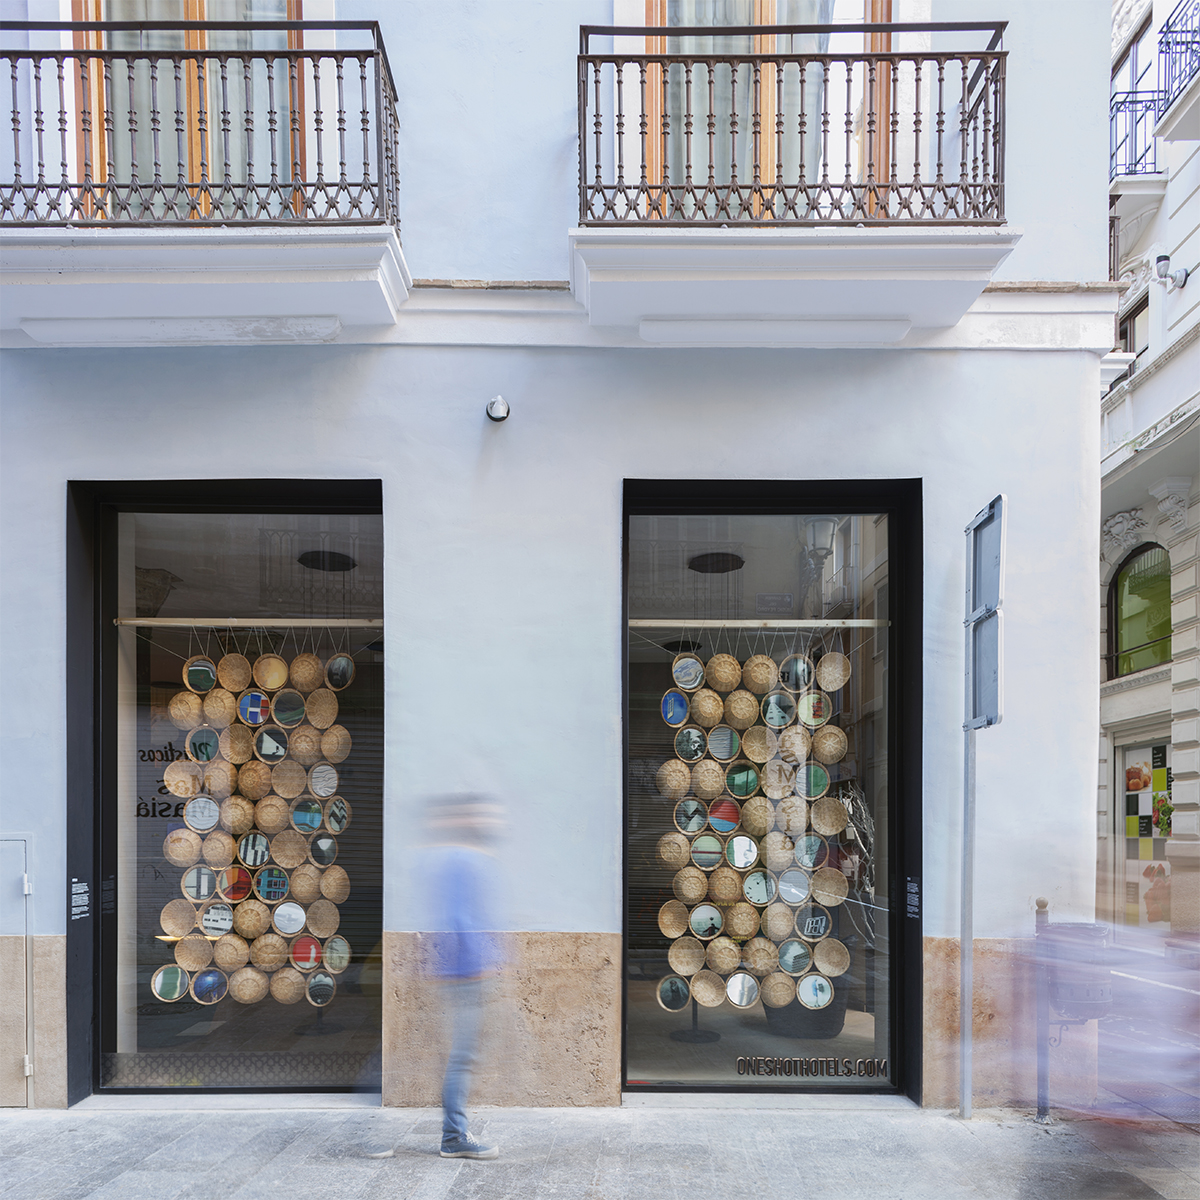 low_01 Intramurs ©Milena Villalba + Santi Vicente 2017